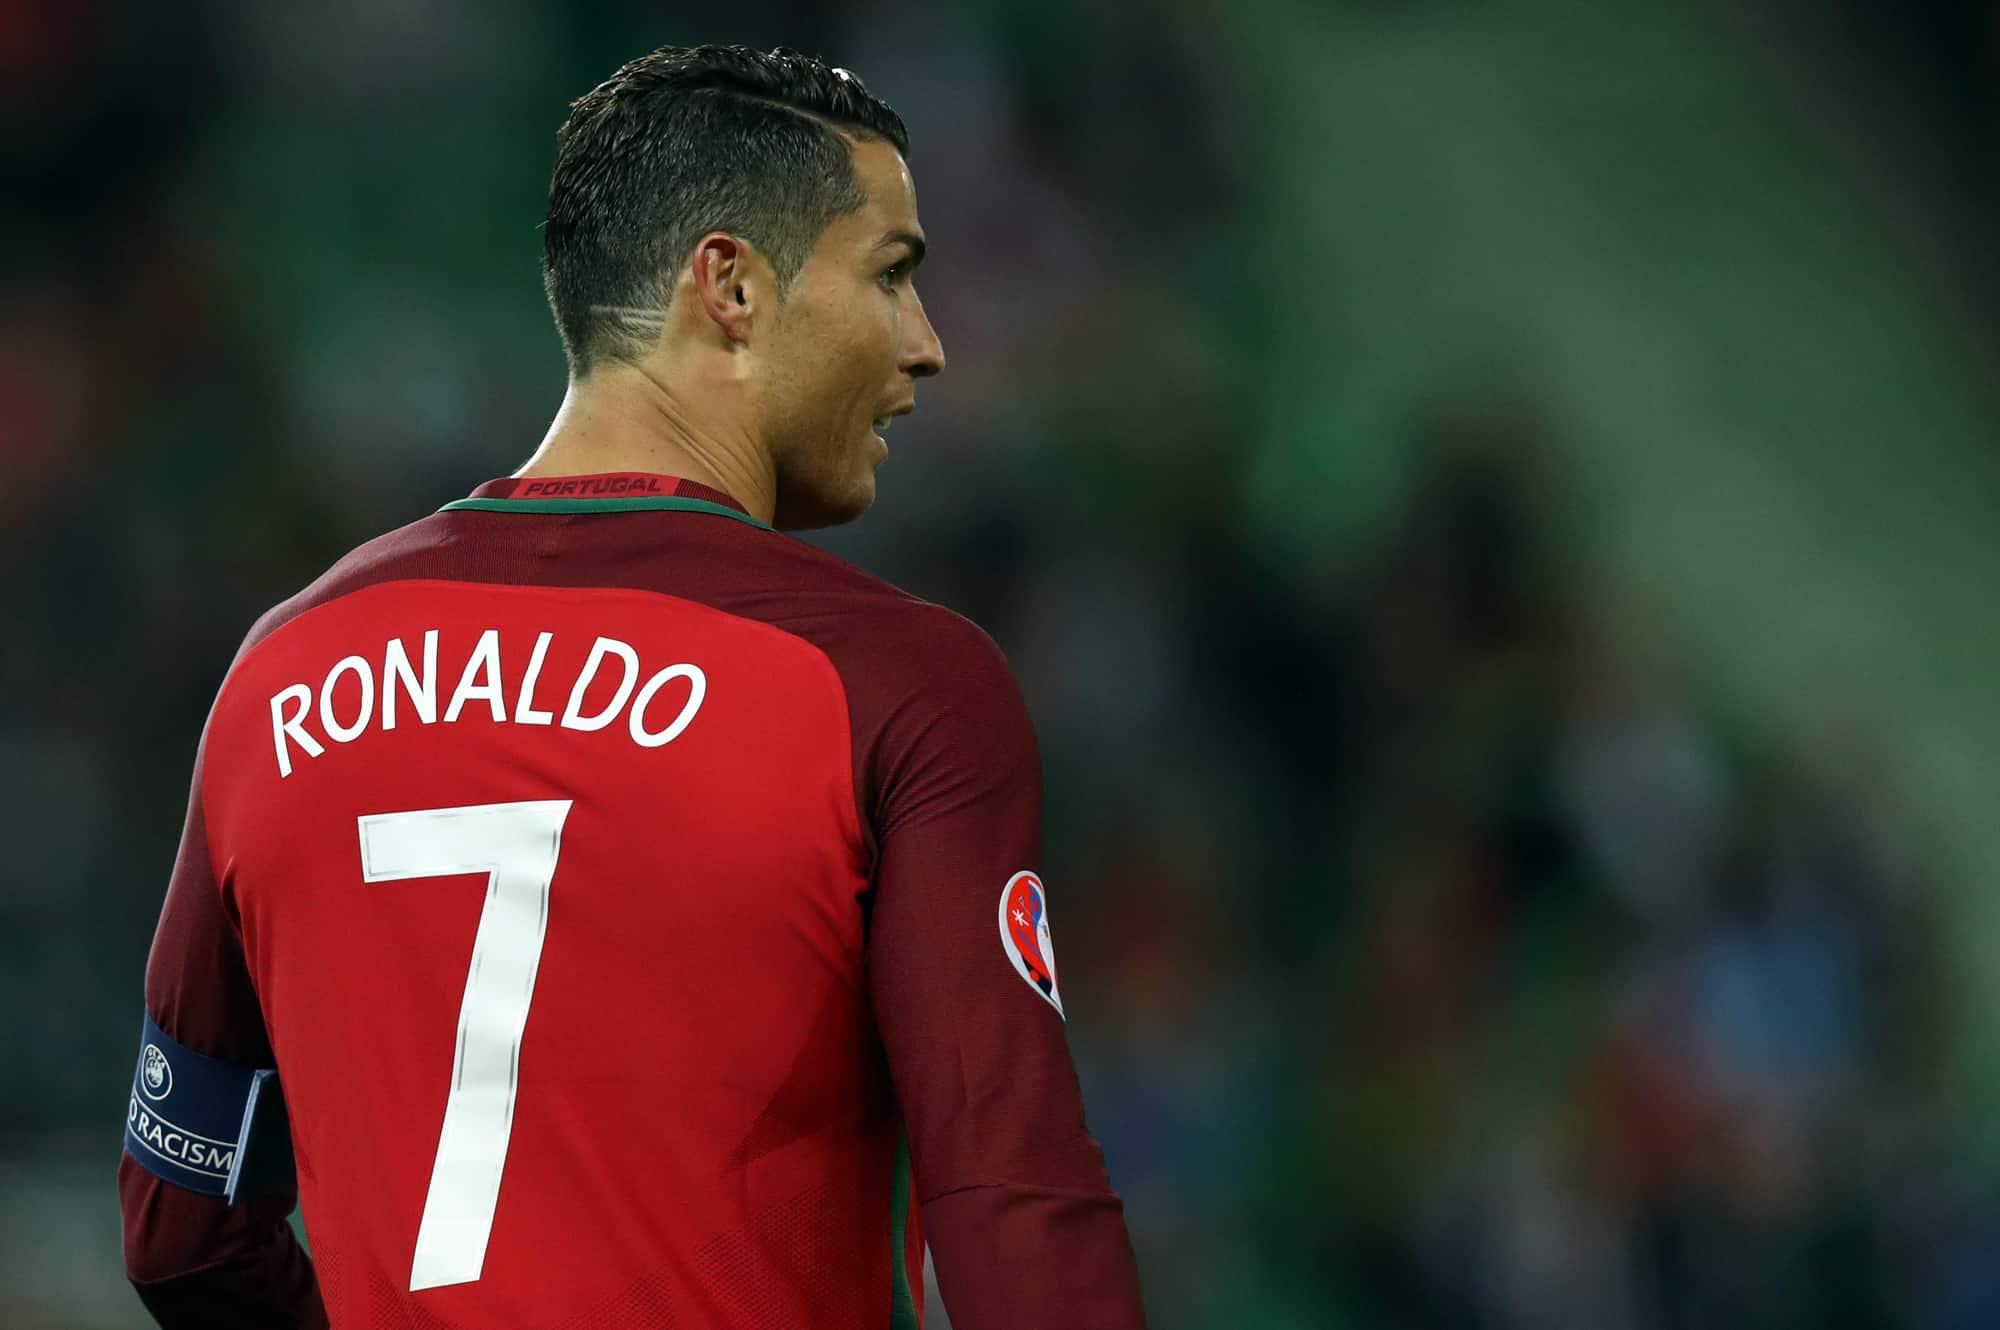 Portugal vs France Preview & Predicted Score